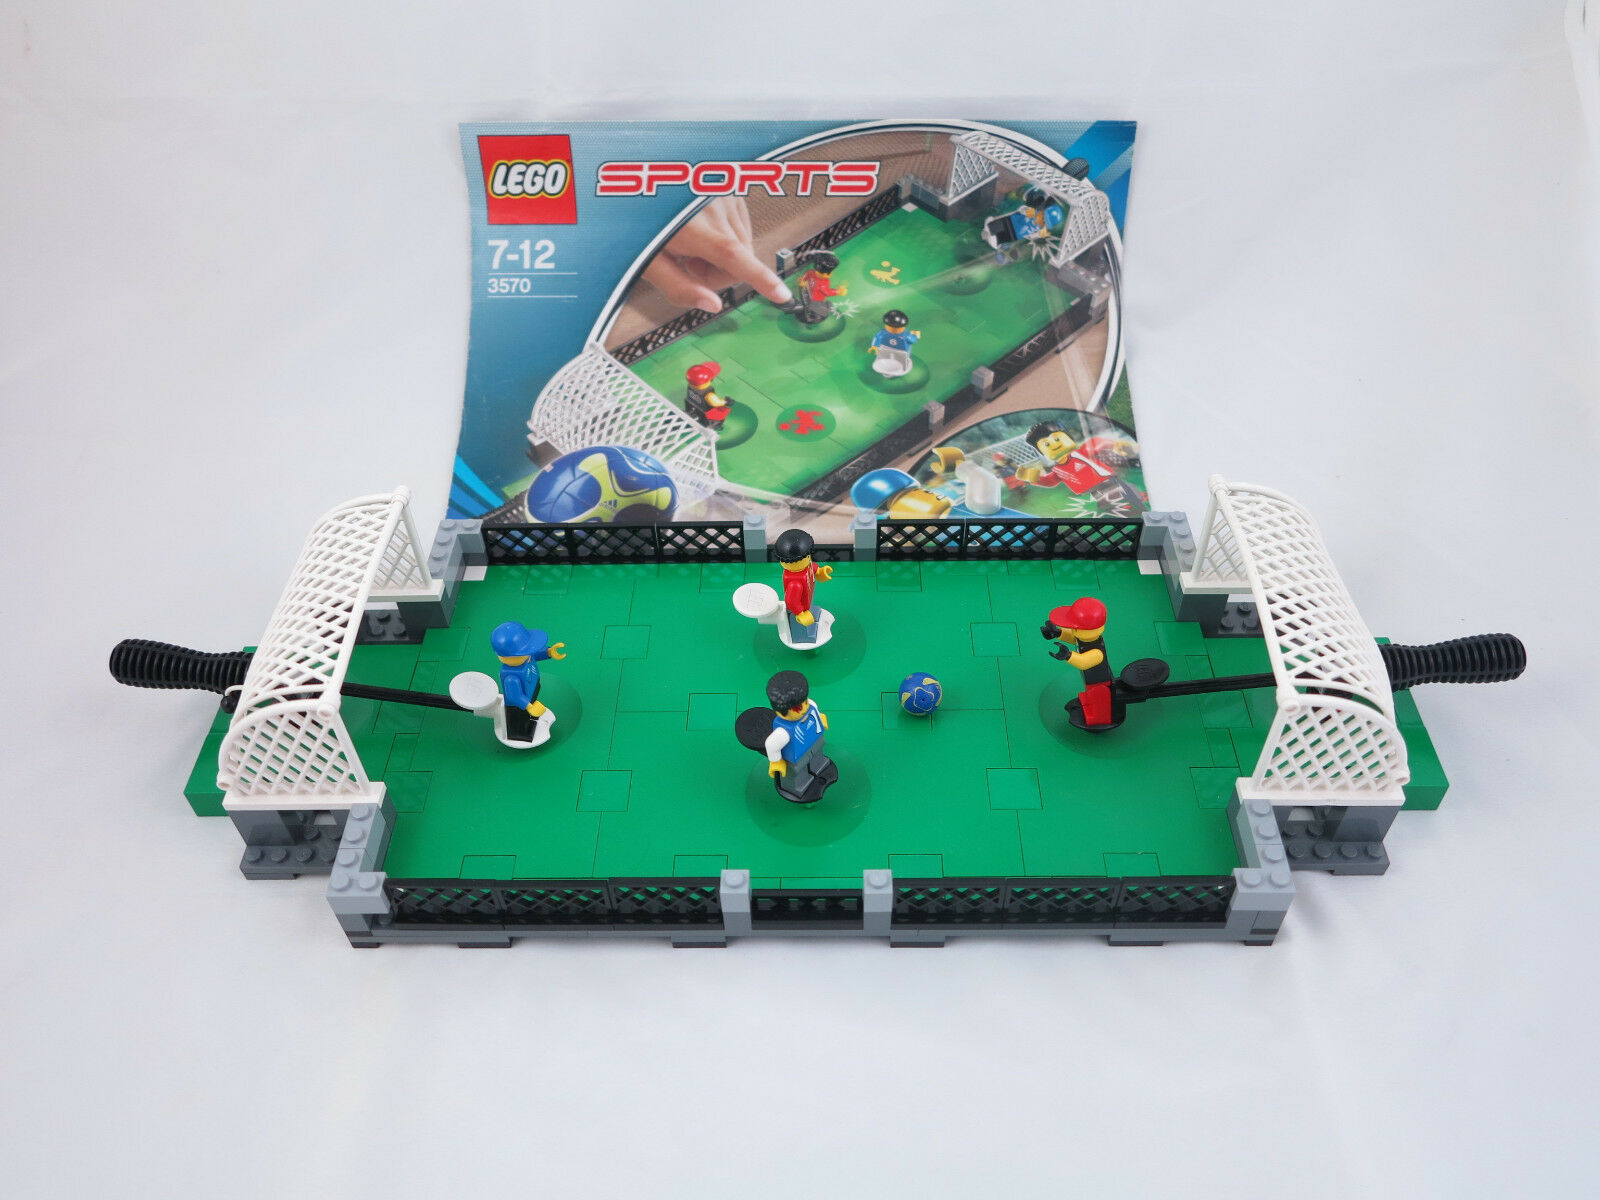 LEGO 3570 Sport-Fussball + original Bauanleitung ( 82)